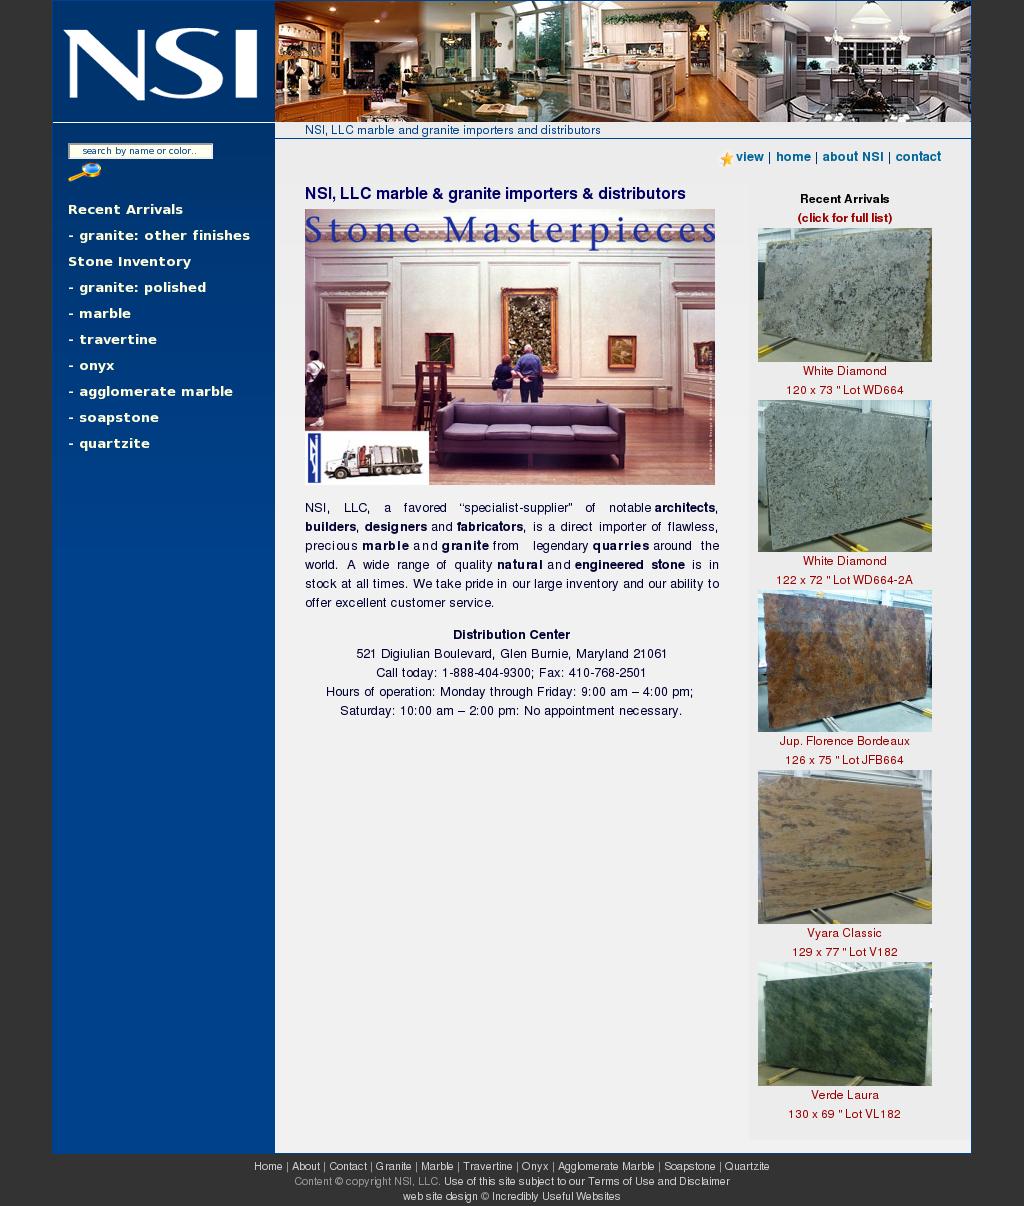 Nsi Llc Marble And Granite Importers And Distributors